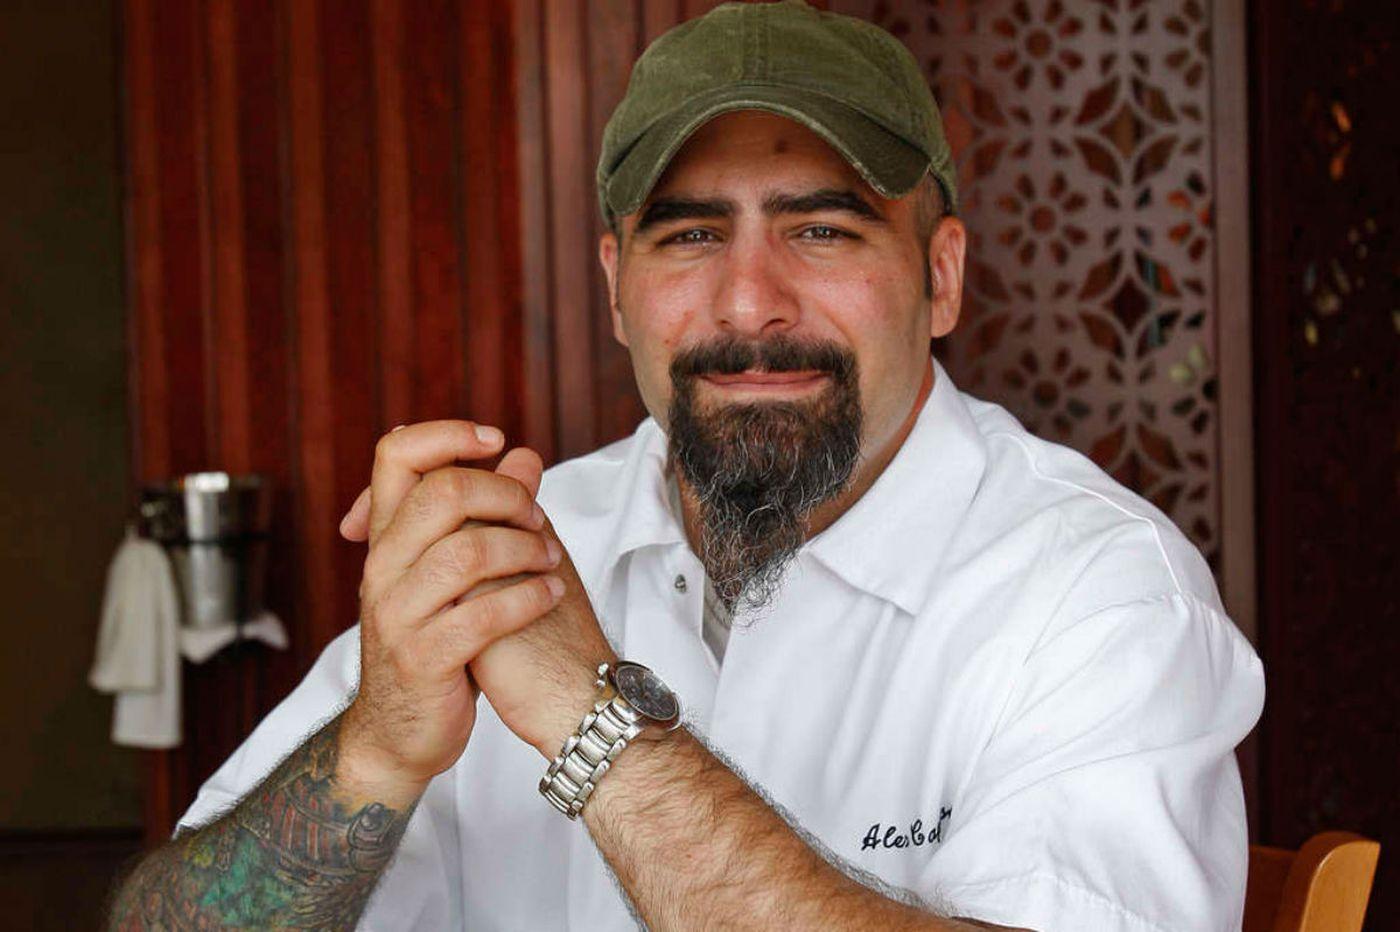 Phila. chef Alex Capasso facing child porn charges